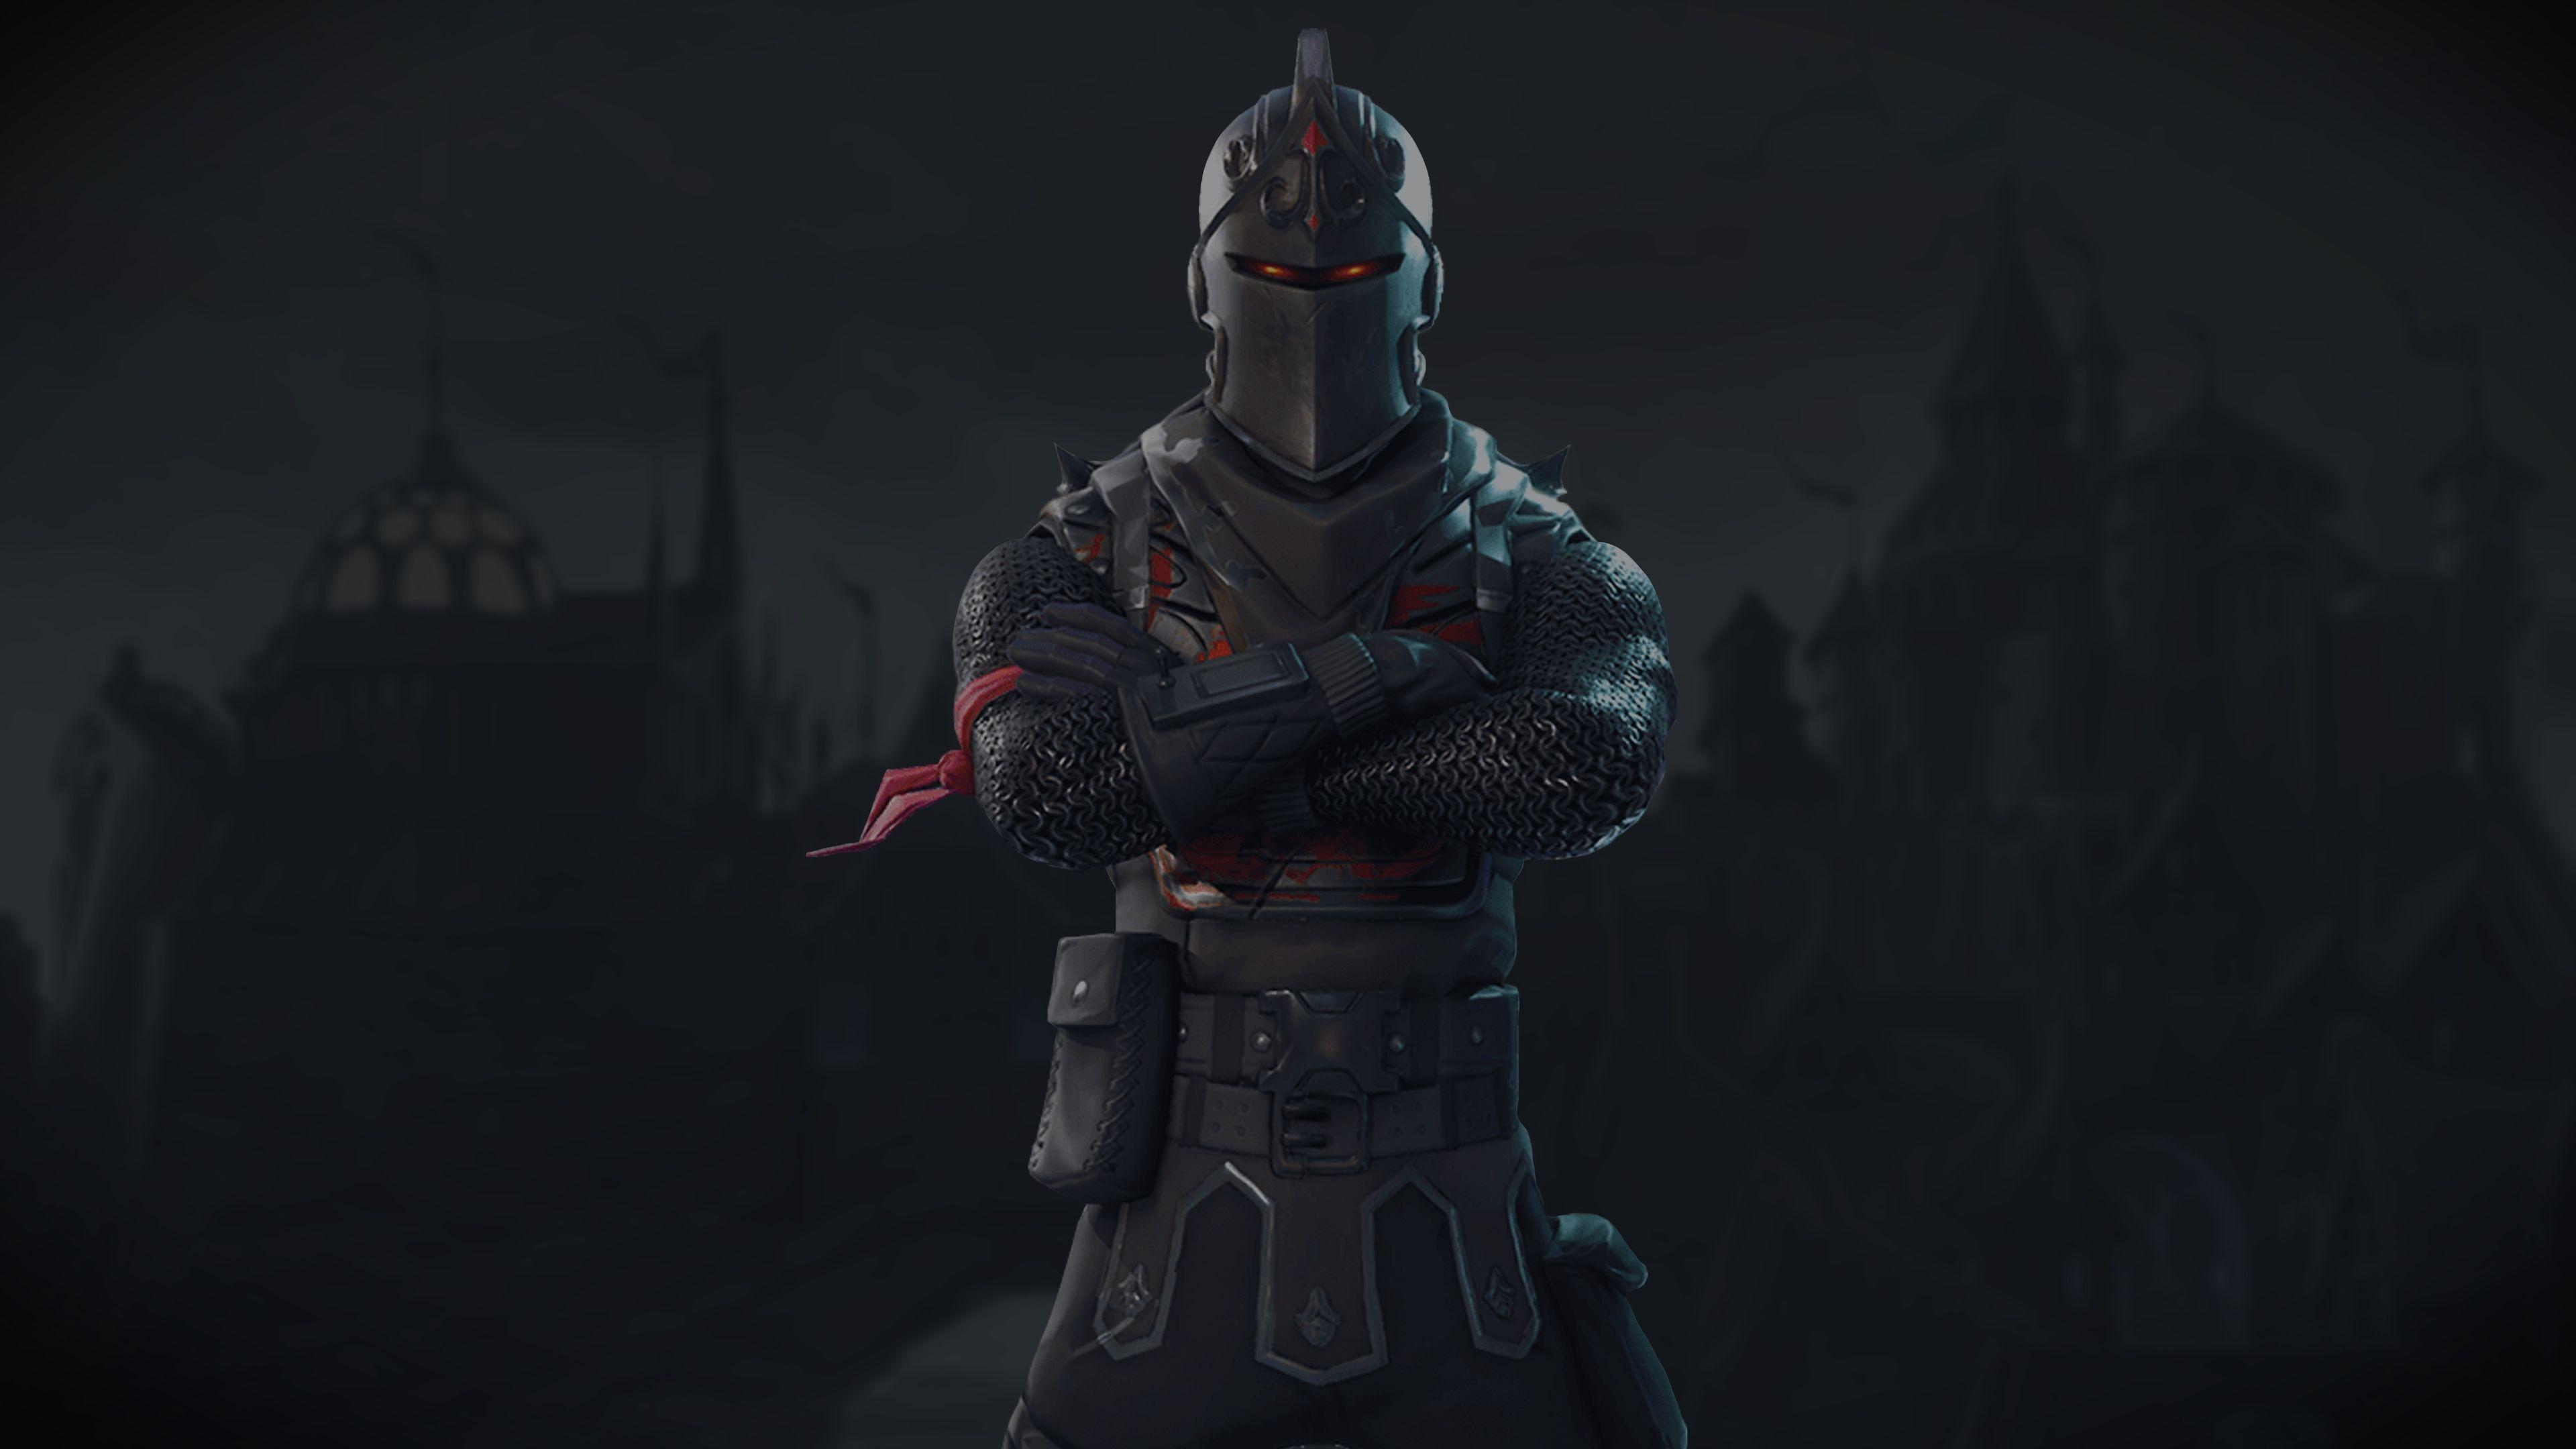 Black Knight Fortnite Battle Royale Video Game 3840x2160 3840x2160